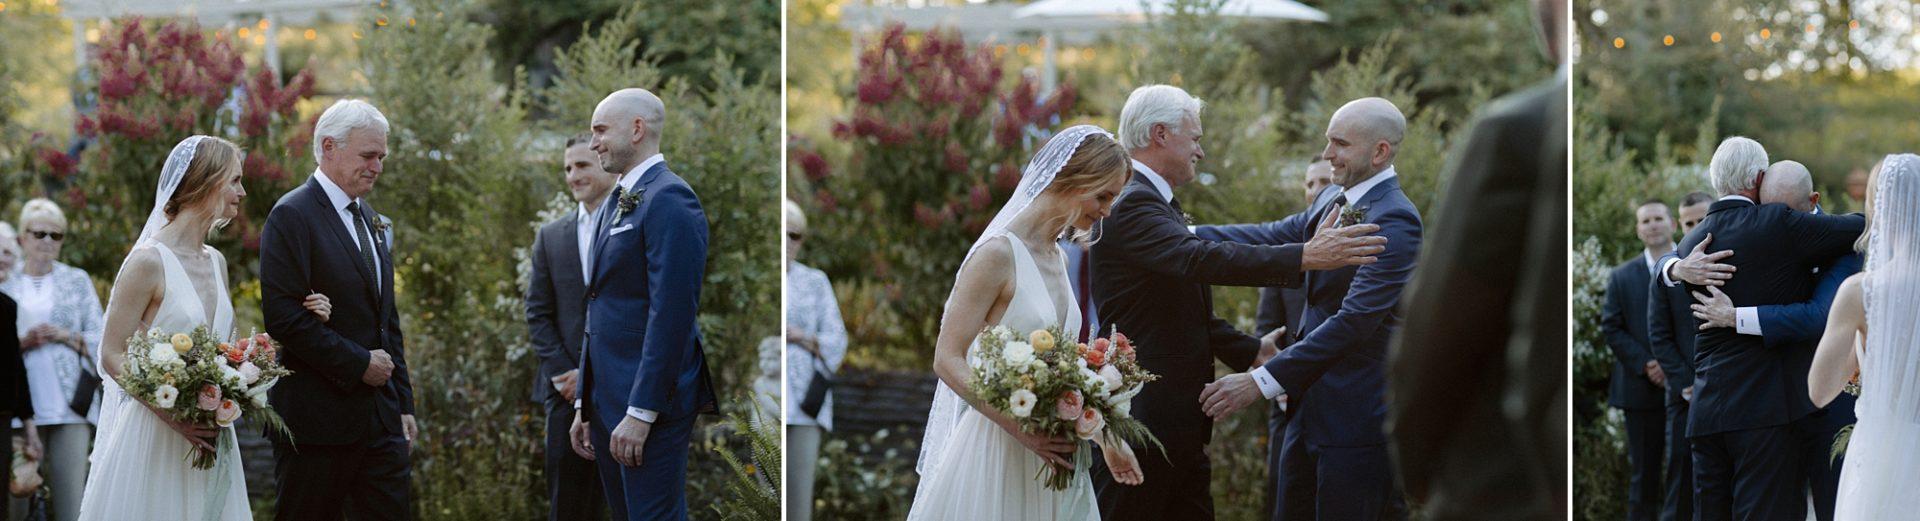 Bride's dad hugging the groom at M & D Farm